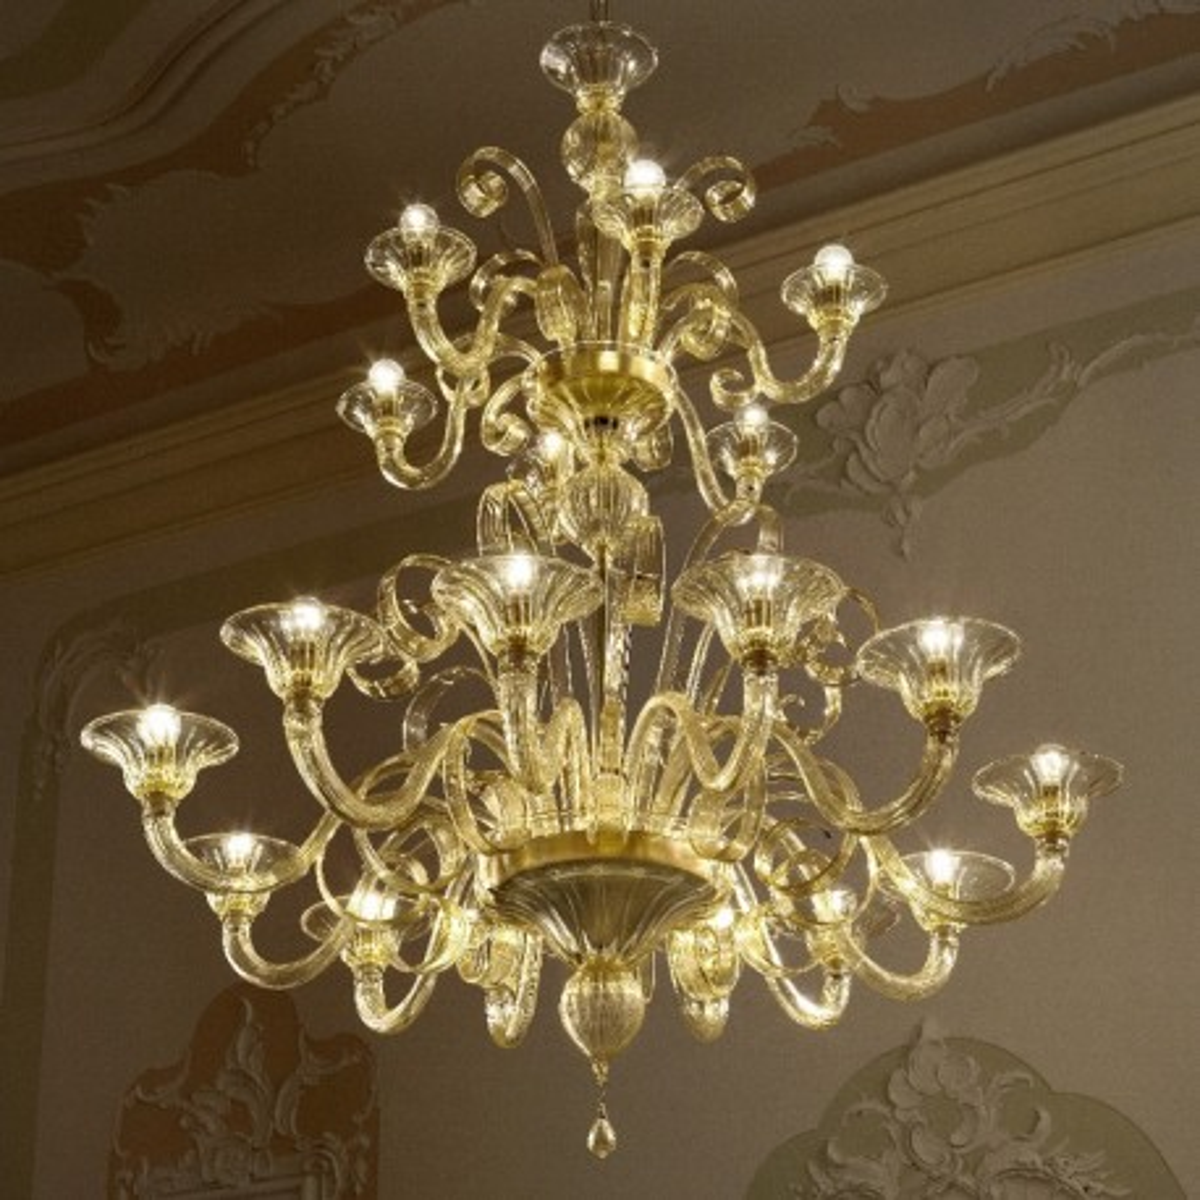 Goldoni 12+6 Luces lámpara de Murano - color ámbar